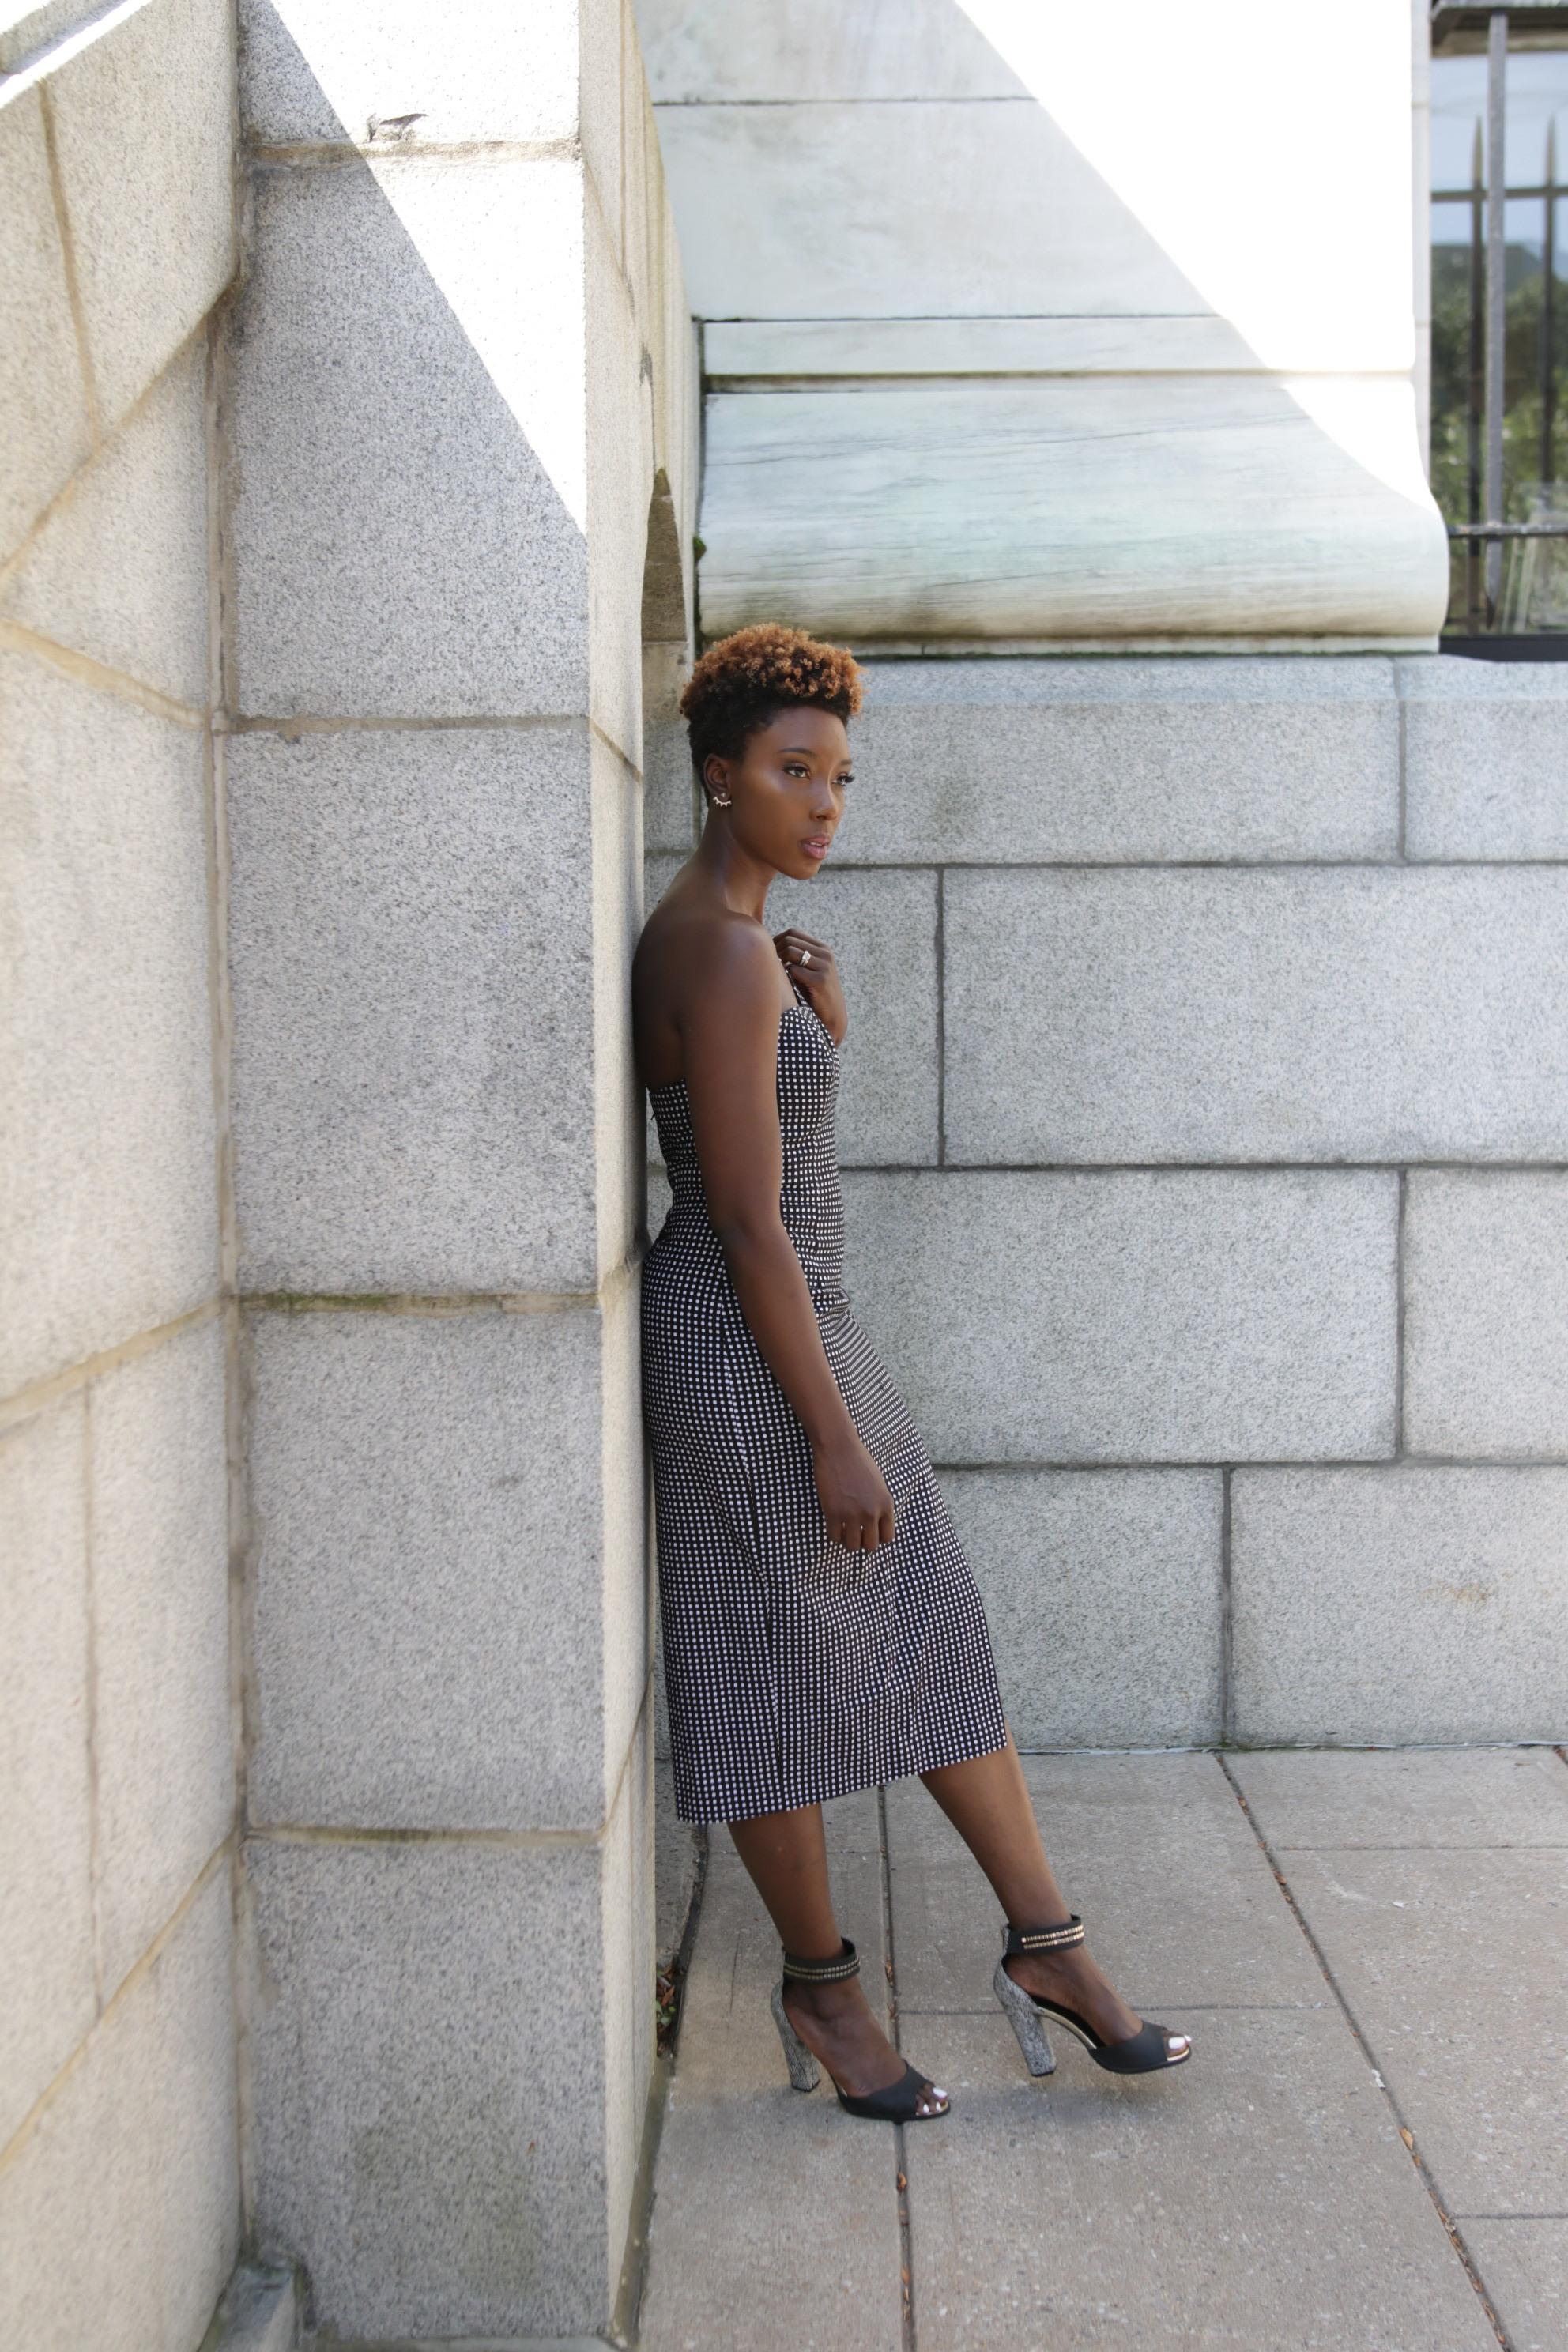 Dayna-Bolden-Forbesp-Article-Millennial-Moms-The-2.4 Trillion-Social-Media-Influencer-2.PNG